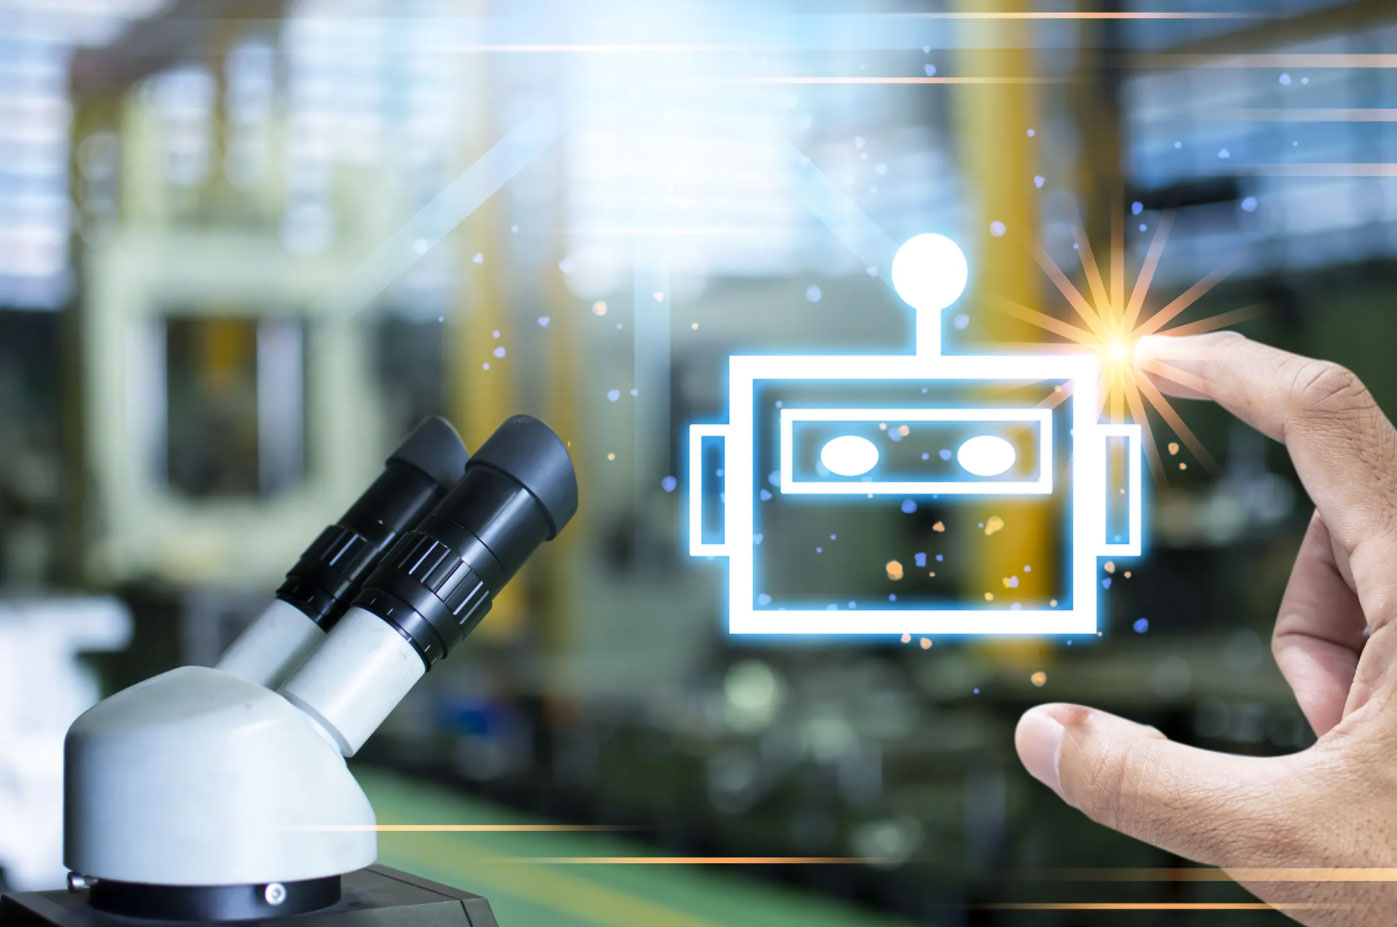 IT Insight 検査工程を自動化するAI画像認識技術